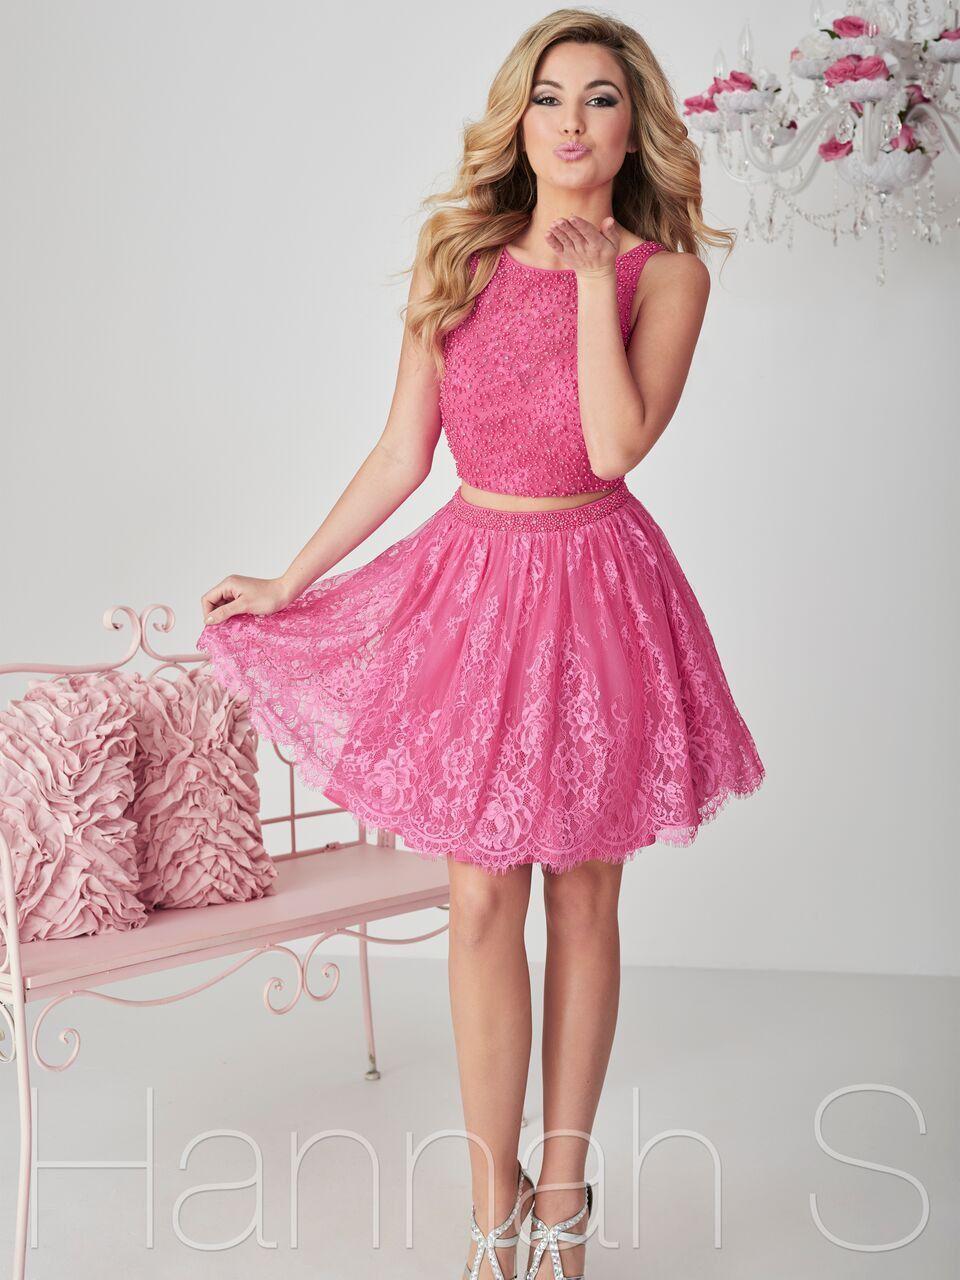 fuchsia short homecoming dress uuu homecoming